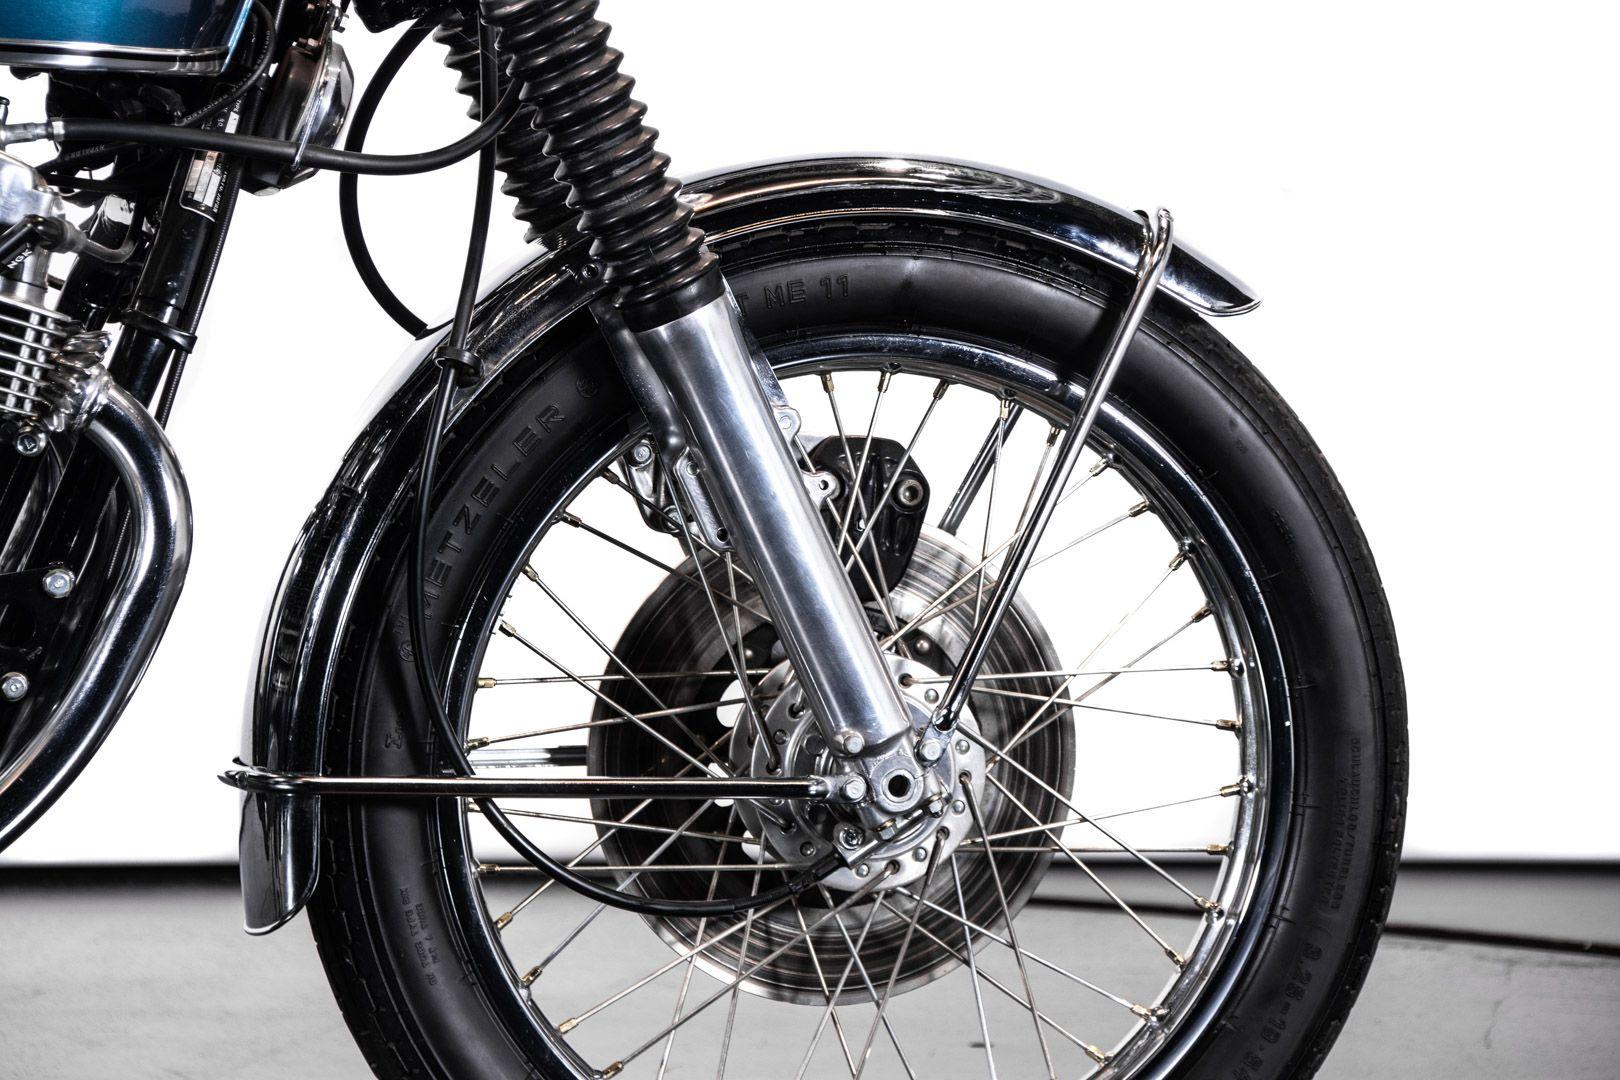 1972 Honda CB 750 Four G K2 83937